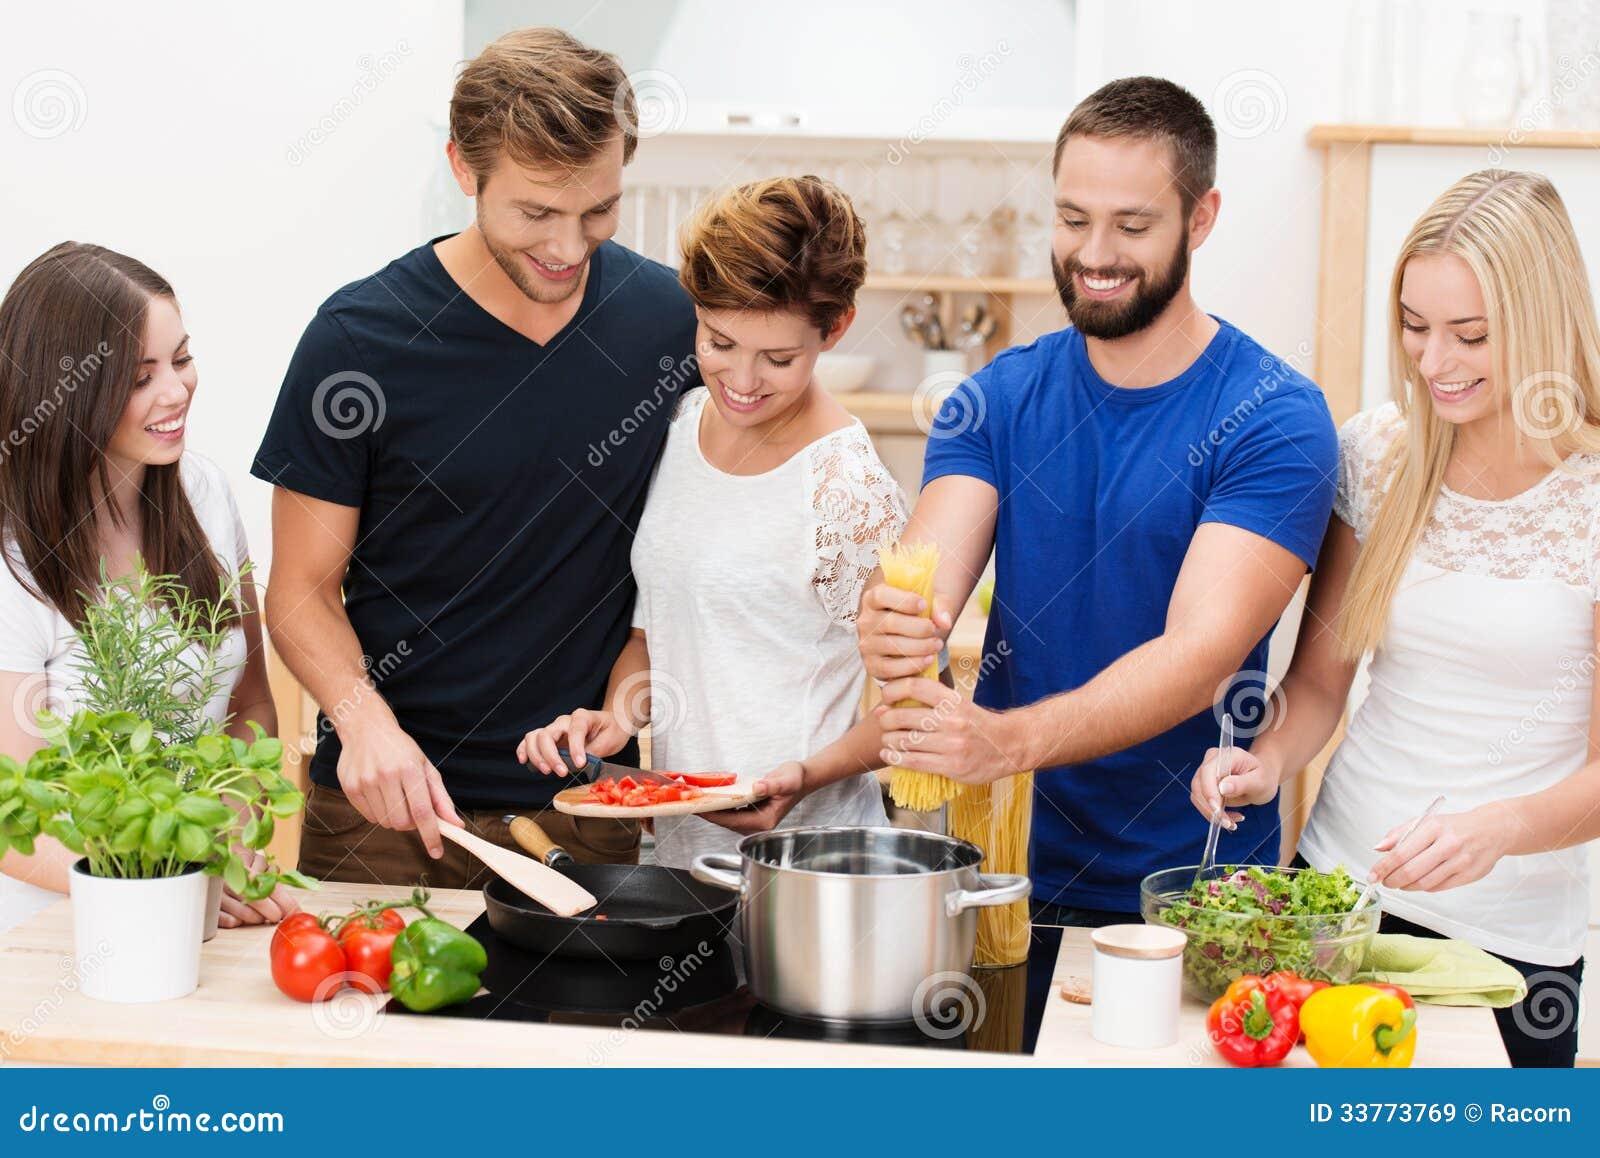 Group Of Friends Preparing Dinner Royalty Free Stock